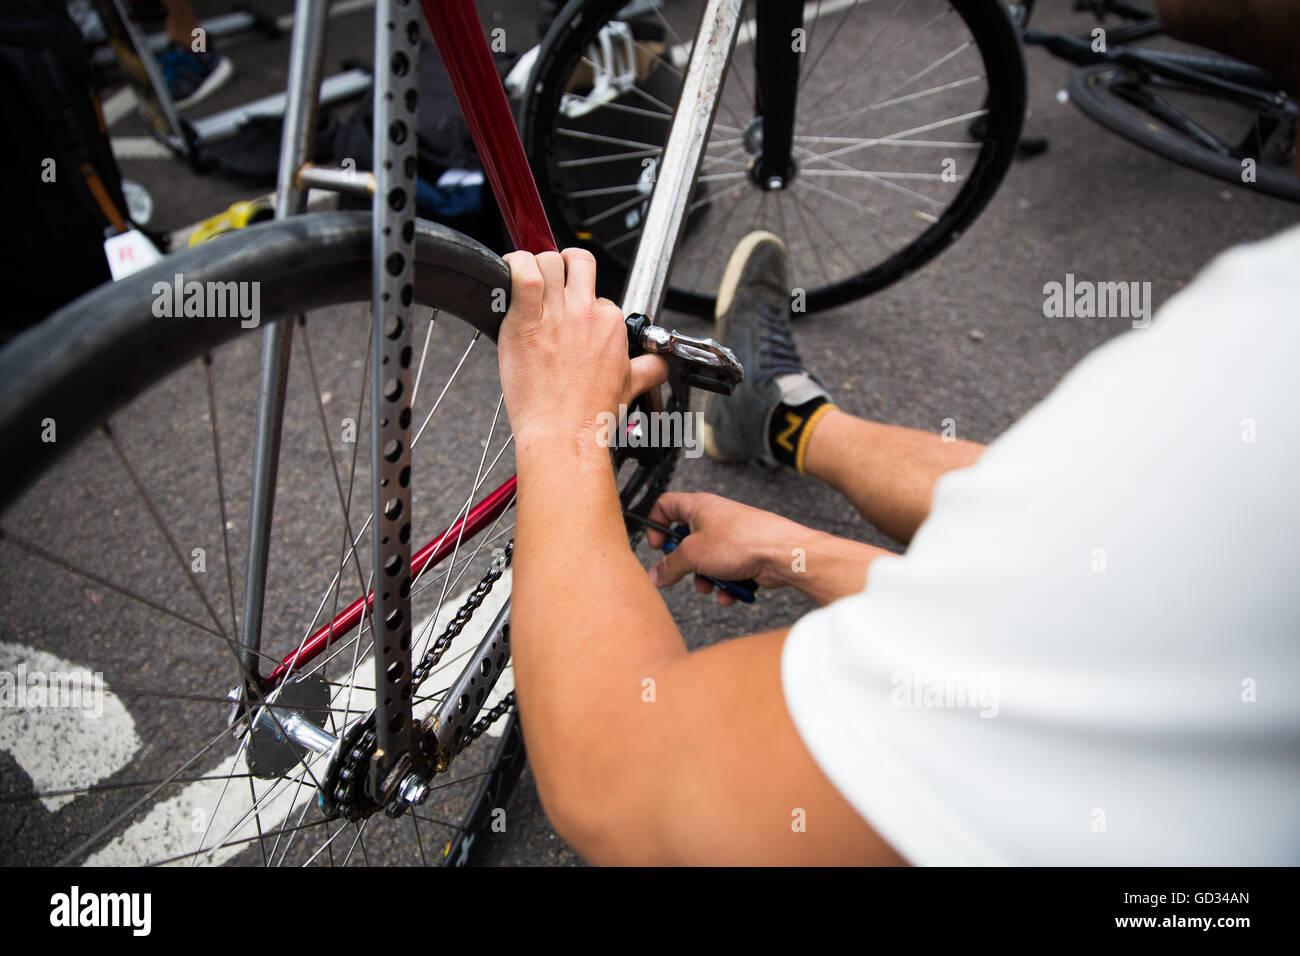 Großartig Fahrradrahmen Malerei London Galerie - Benutzerdefinierte ...